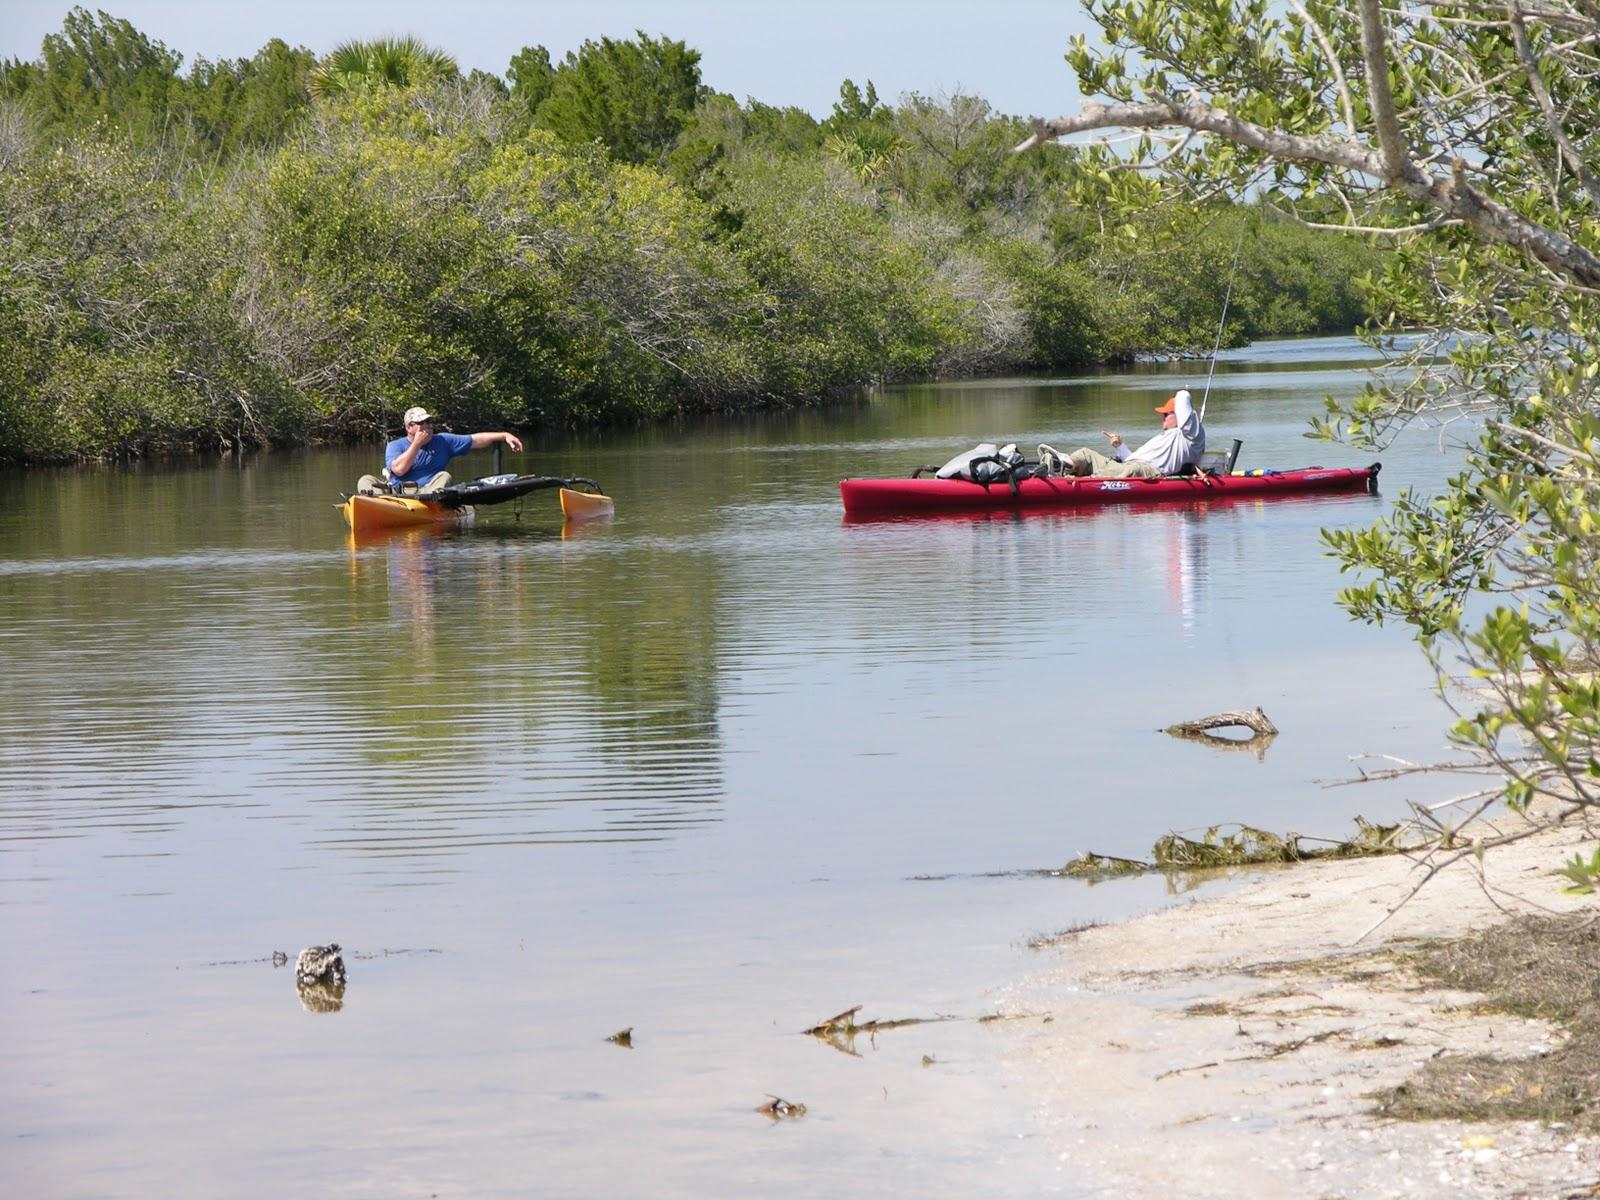 Mosquito lagoon indian river fishing kayakers korner for Indian river fishing